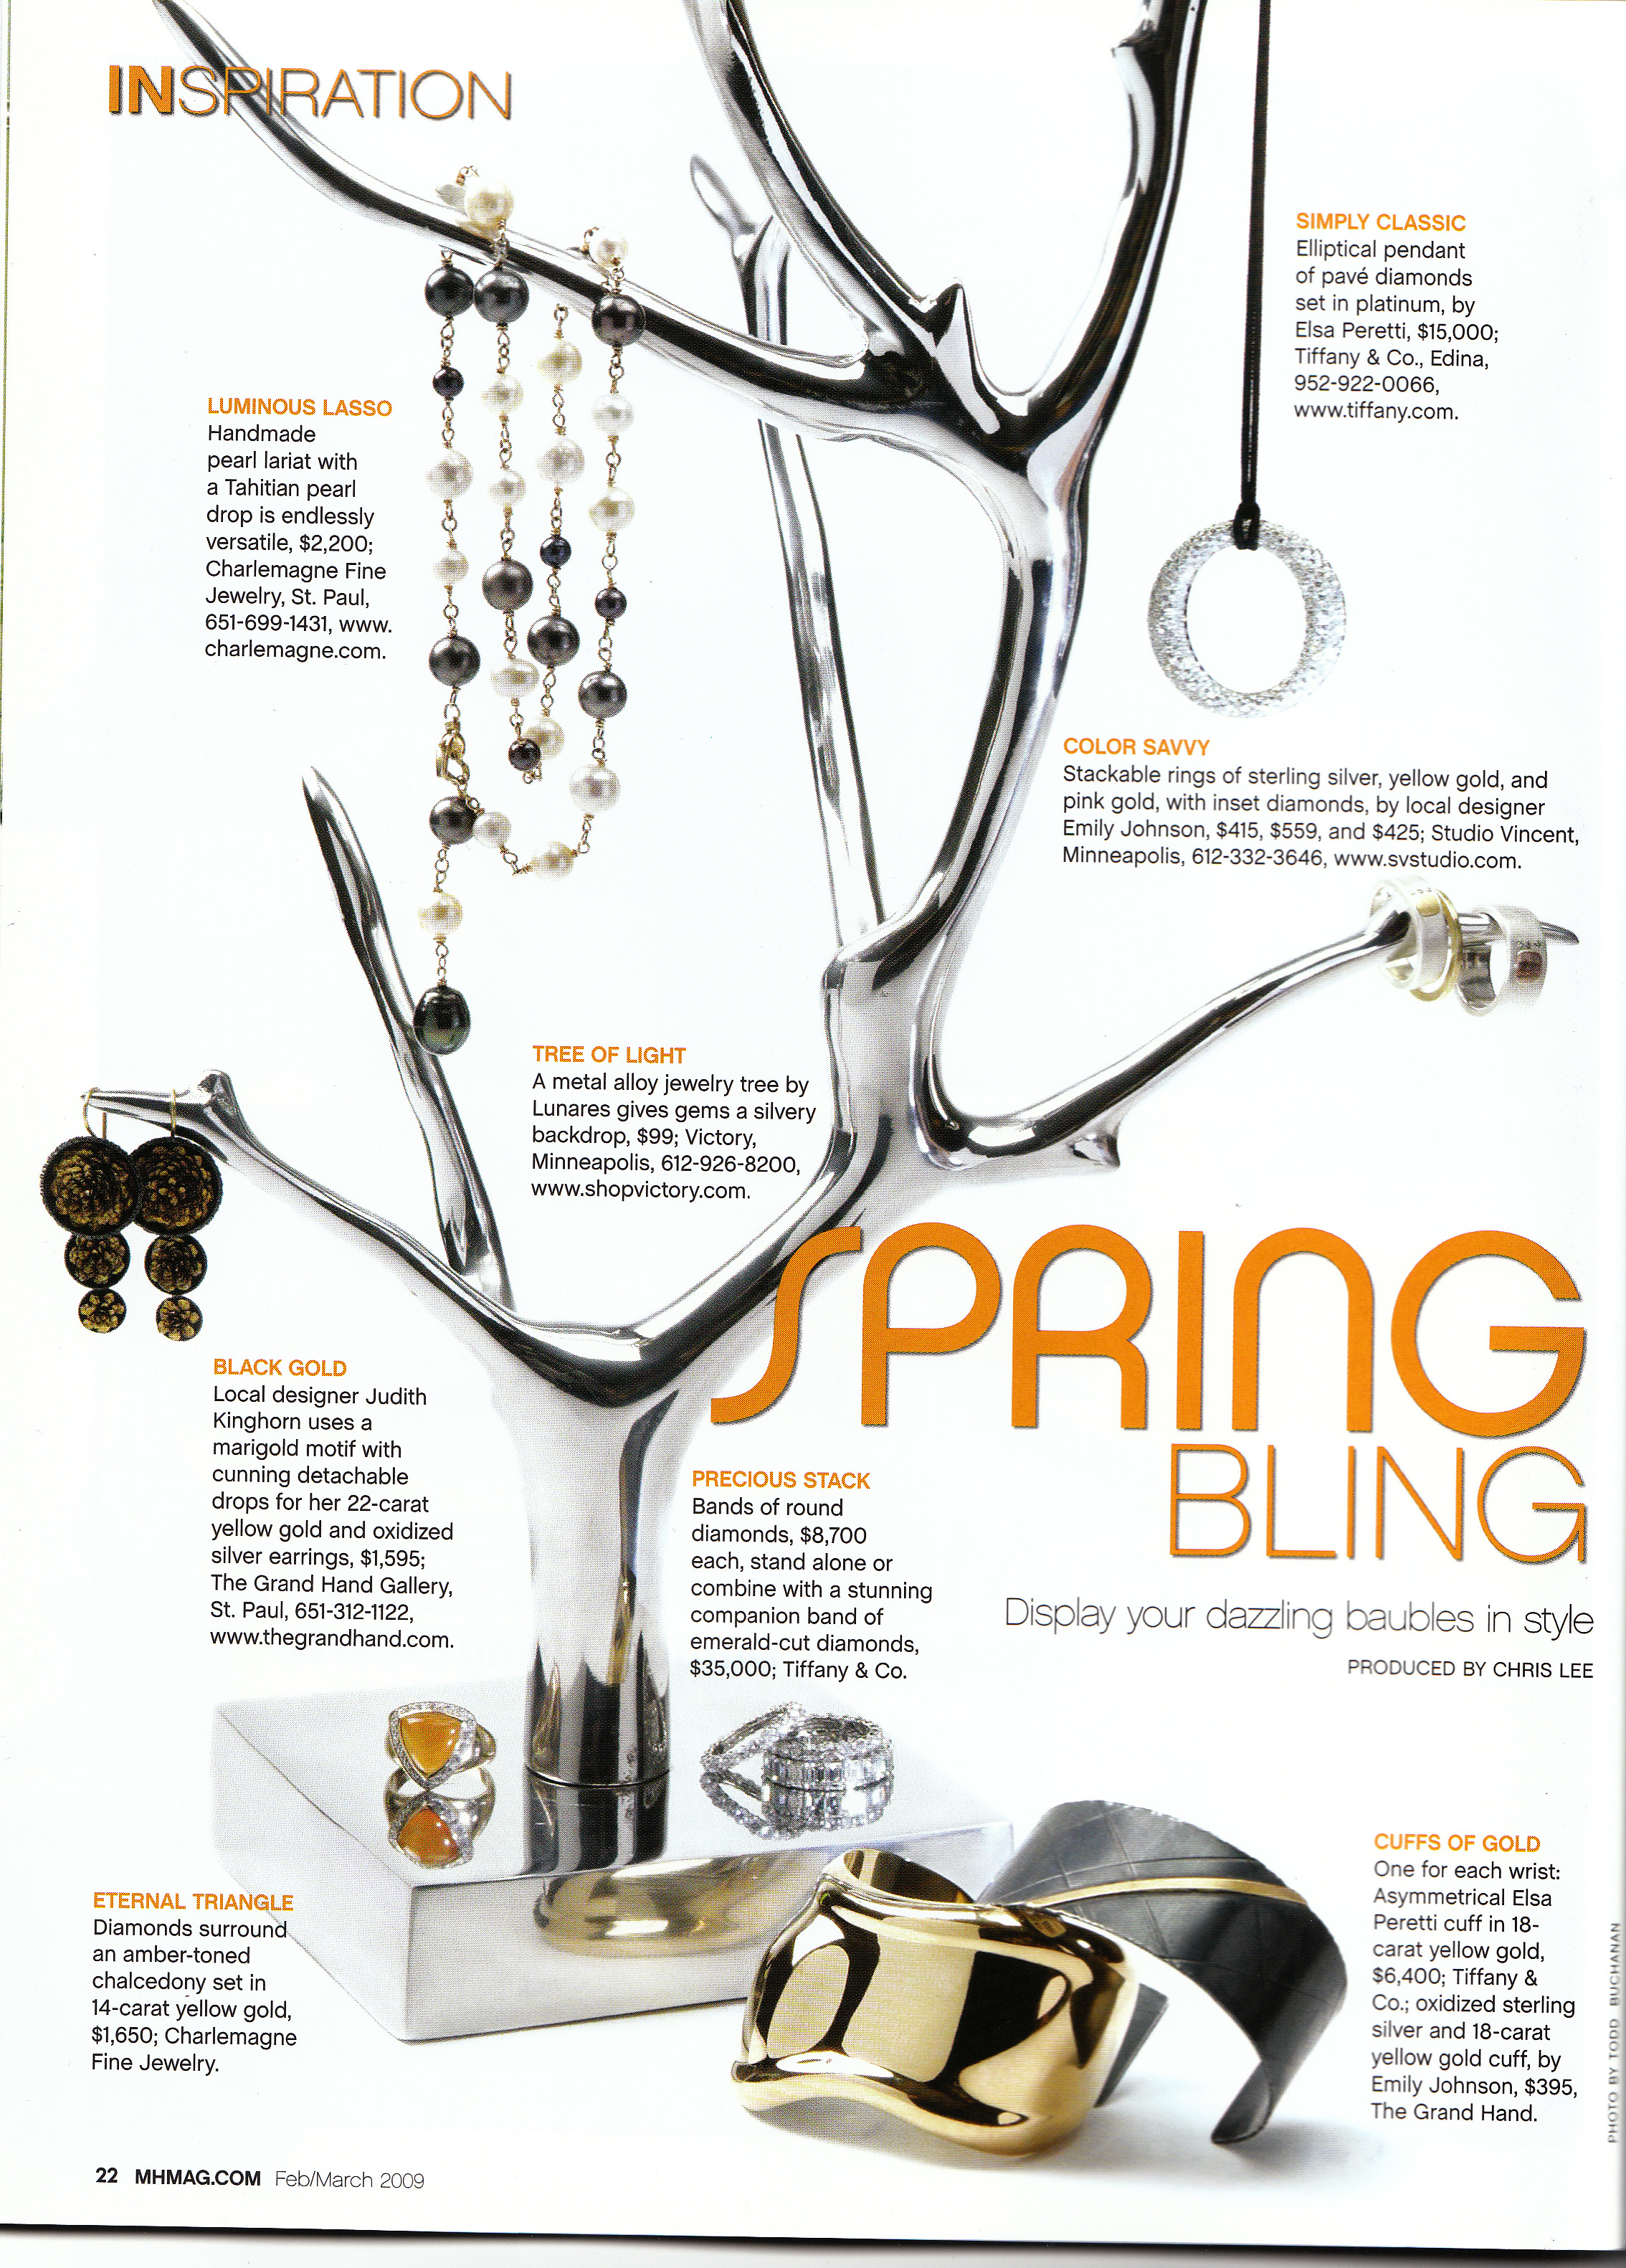 Springbling.jpg